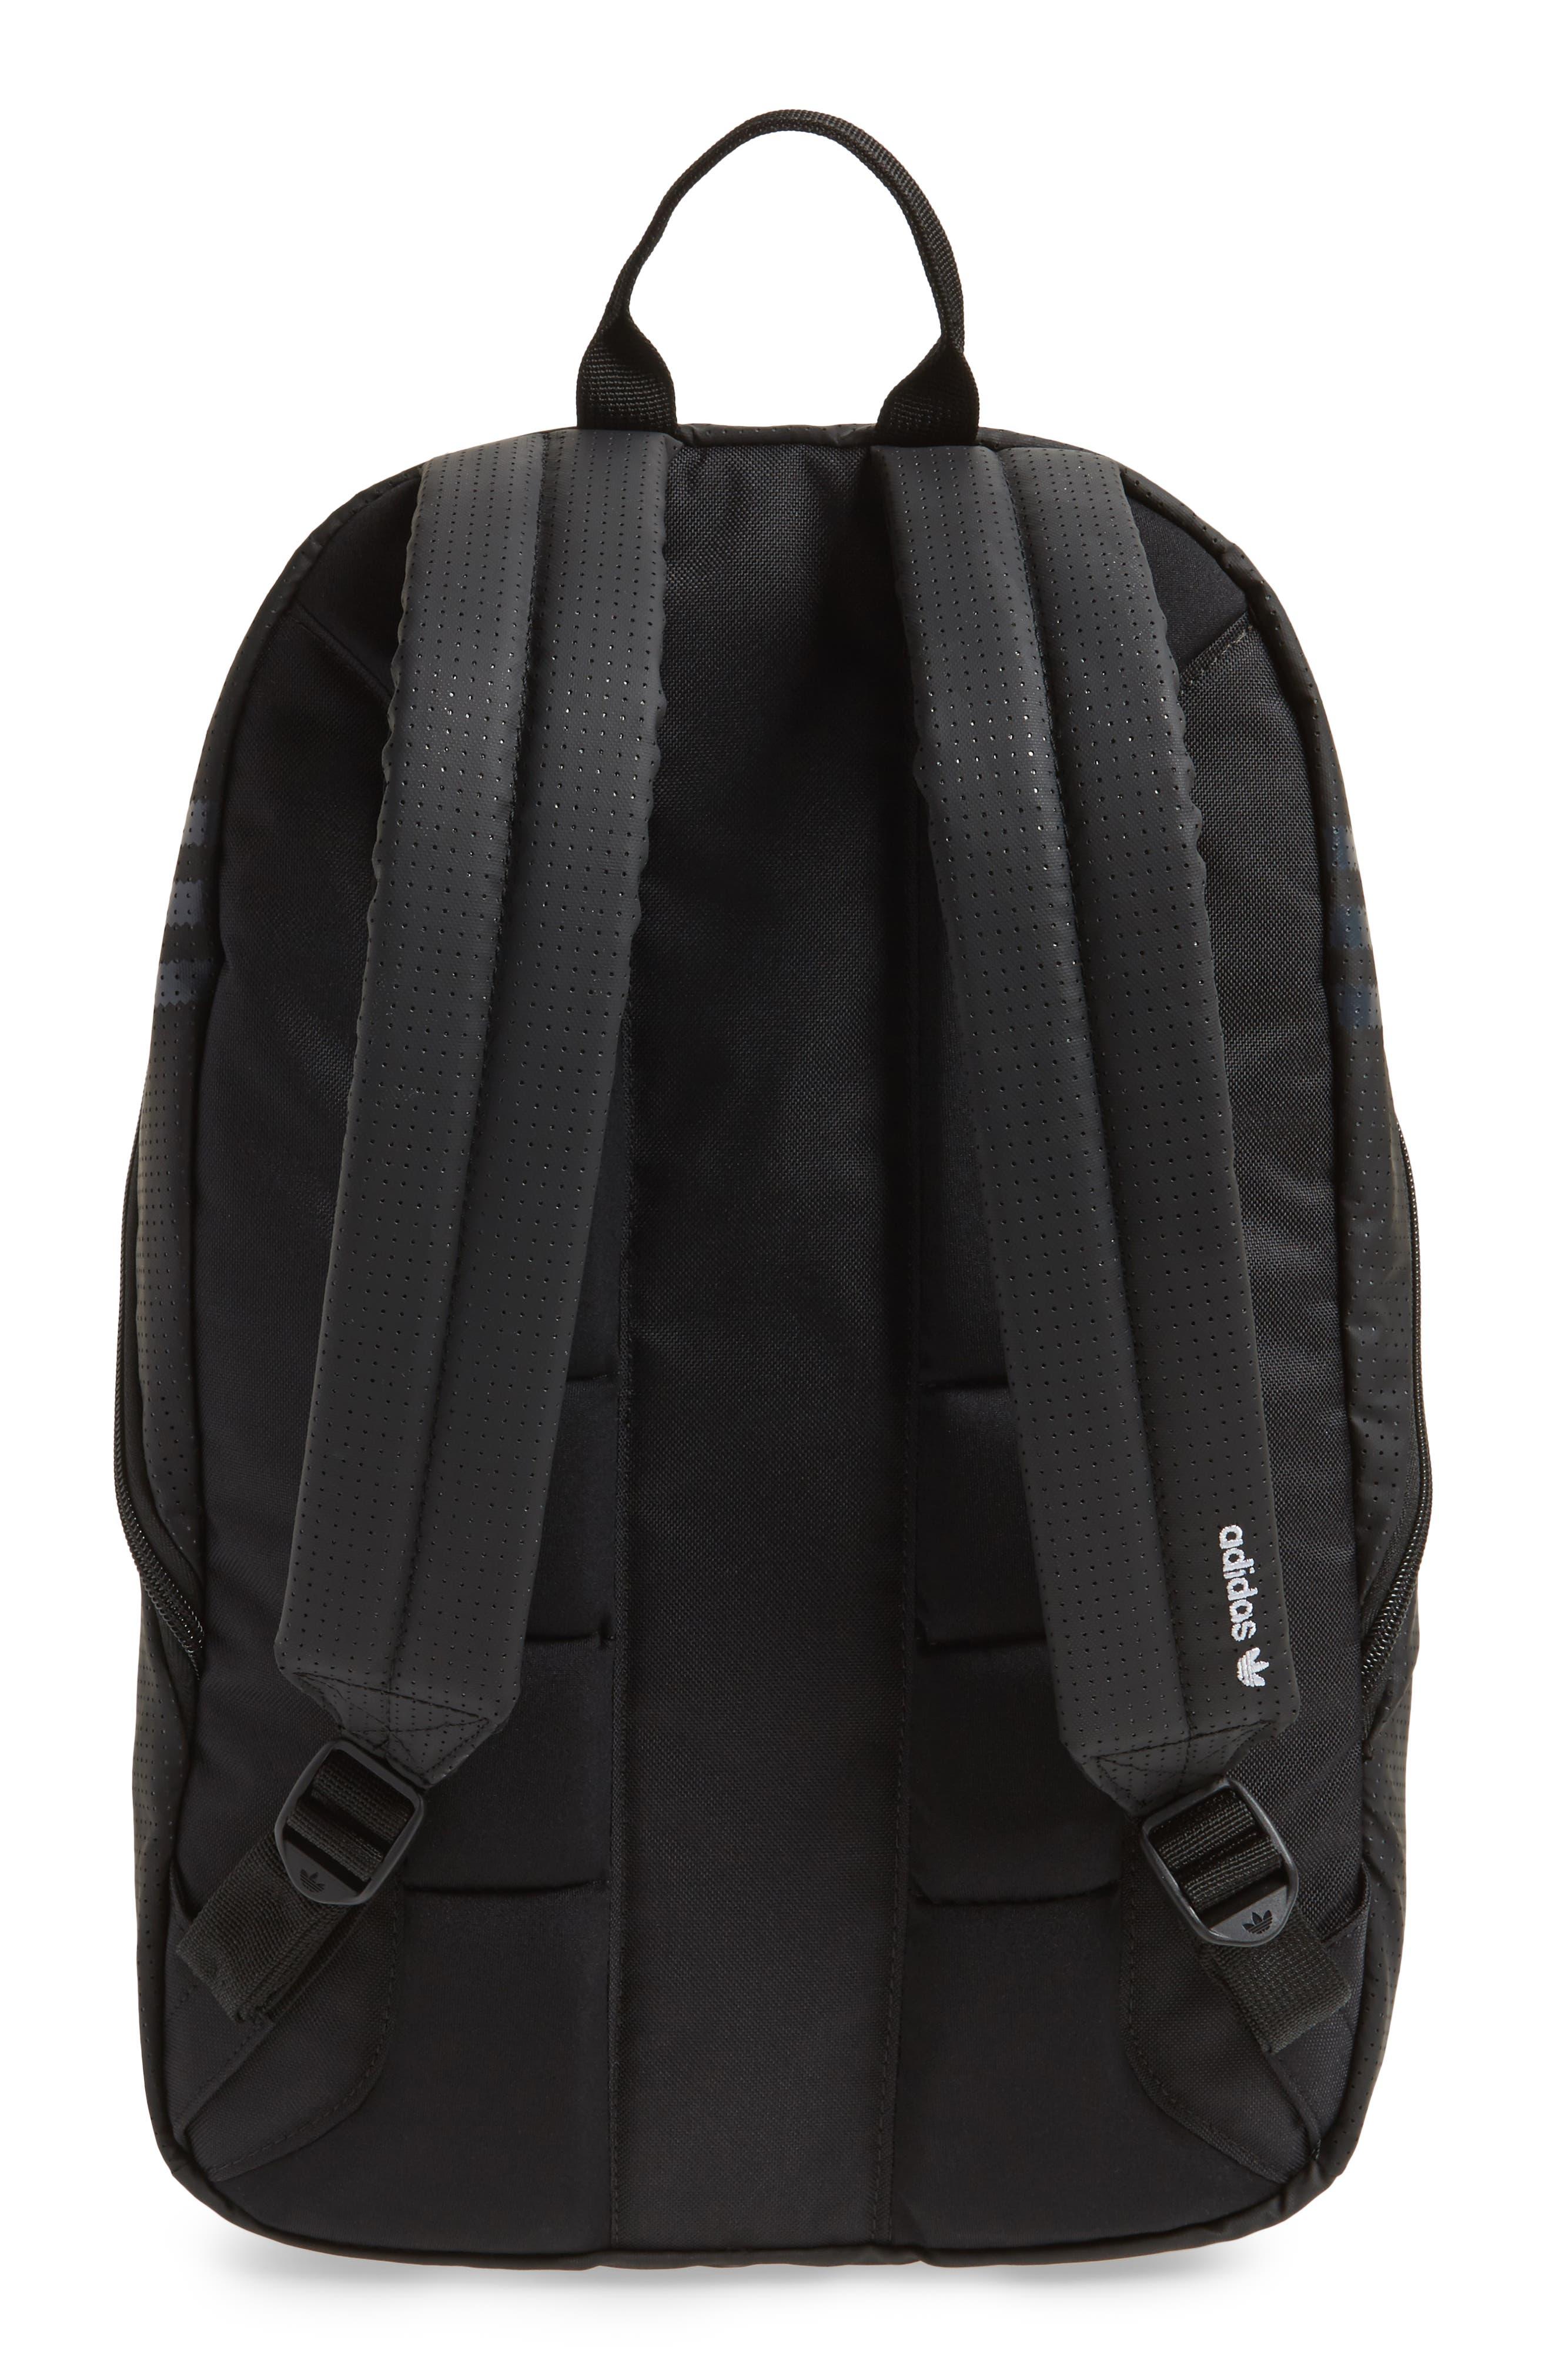 Adidas Backpack Sale Canada Fenix Toulouse Handball